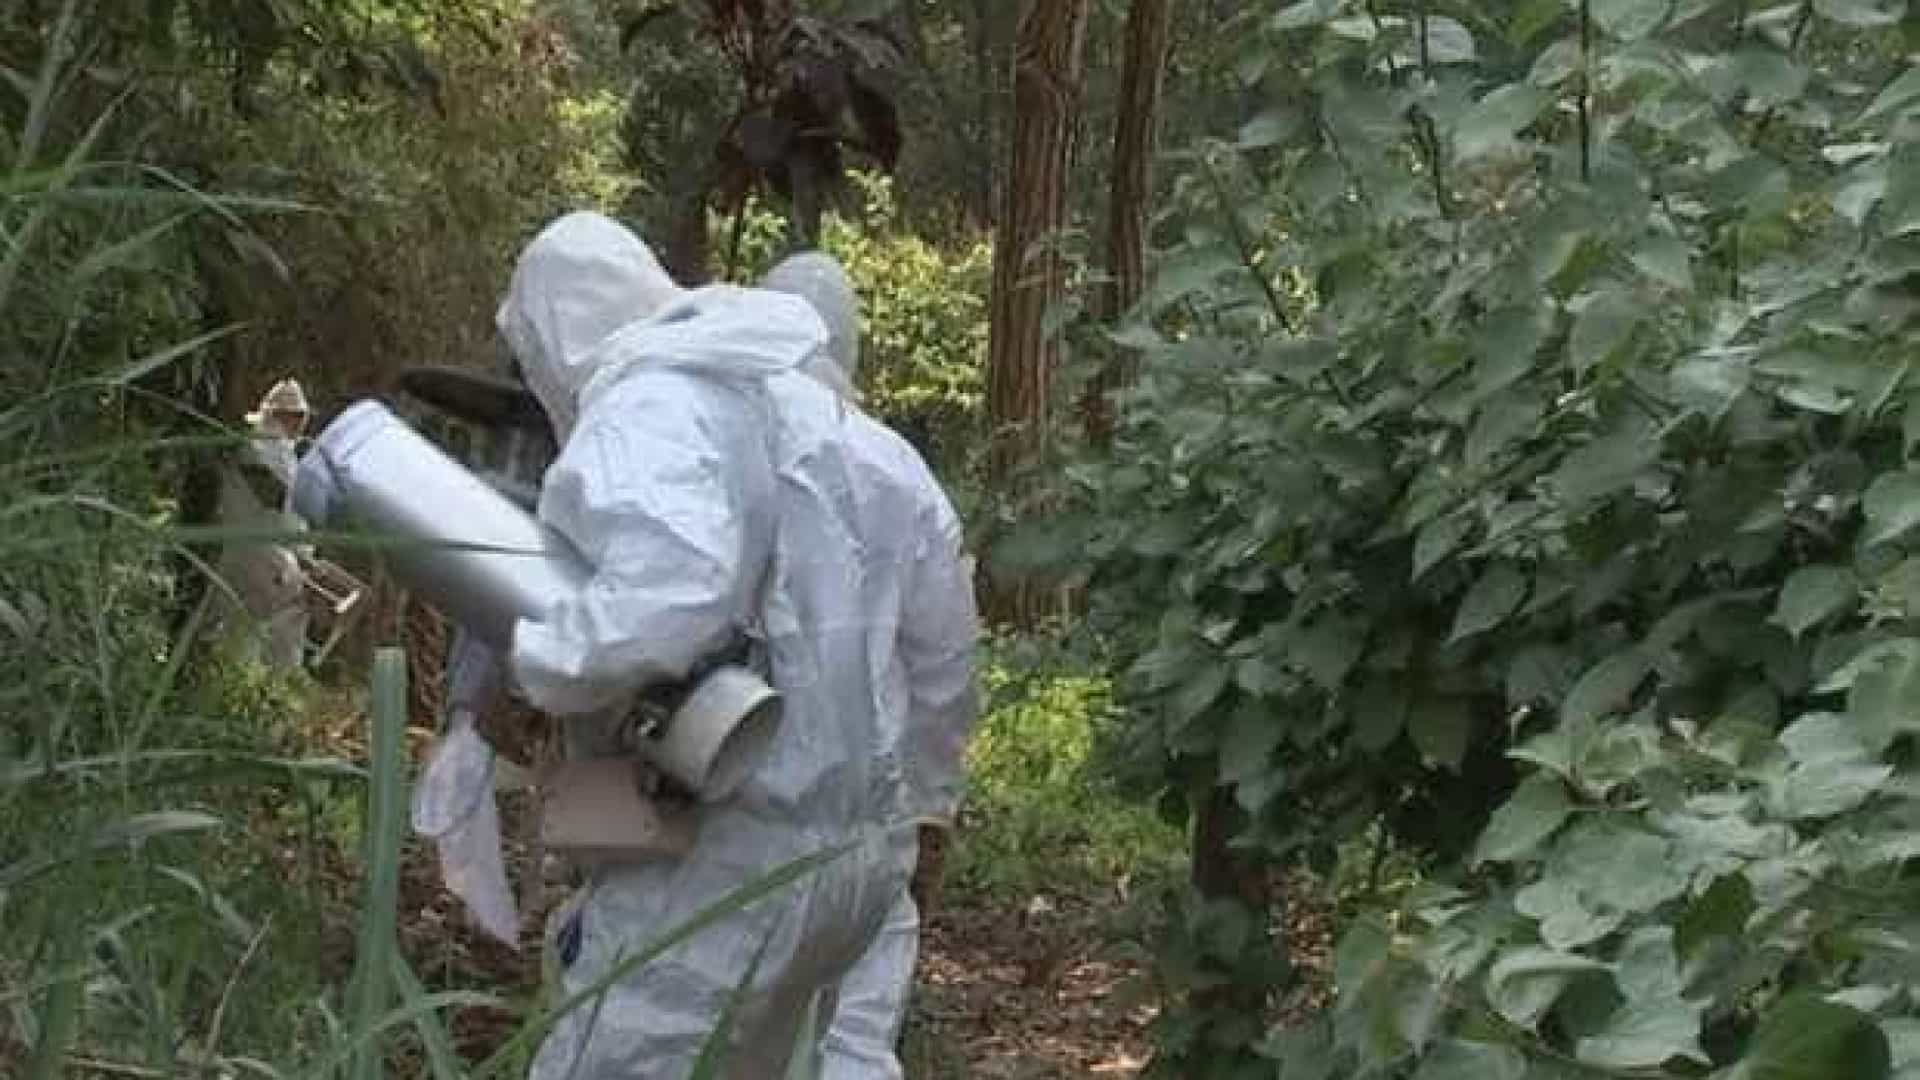 Macaco morre de febre amarela no interior de SP